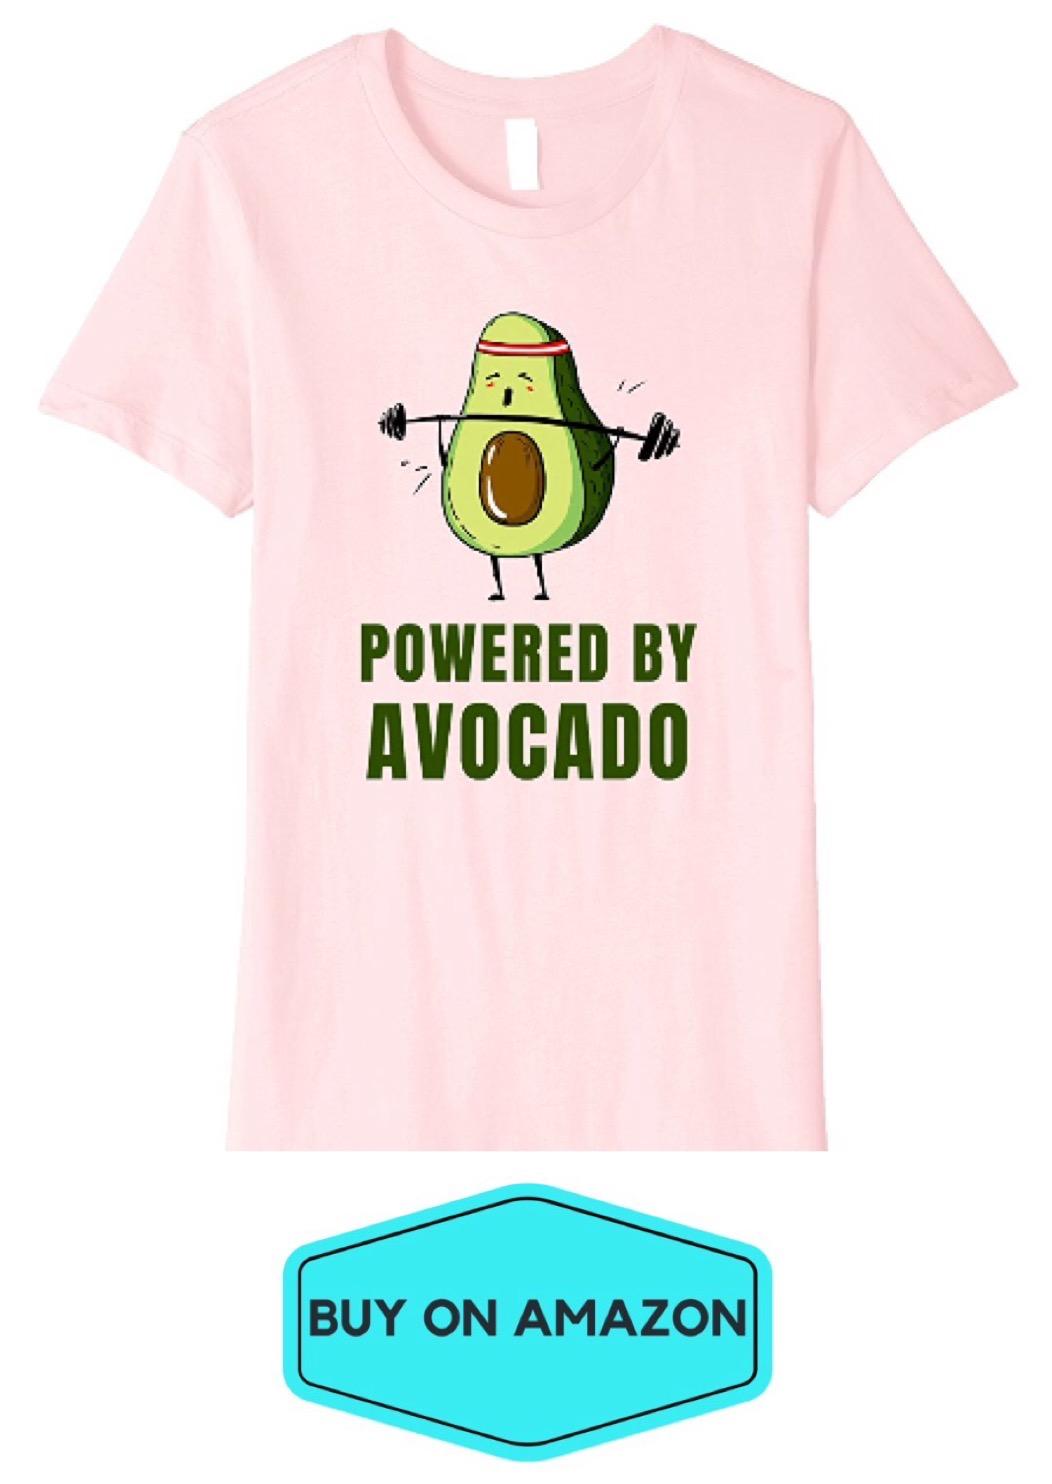 Powered By Avocado Tee